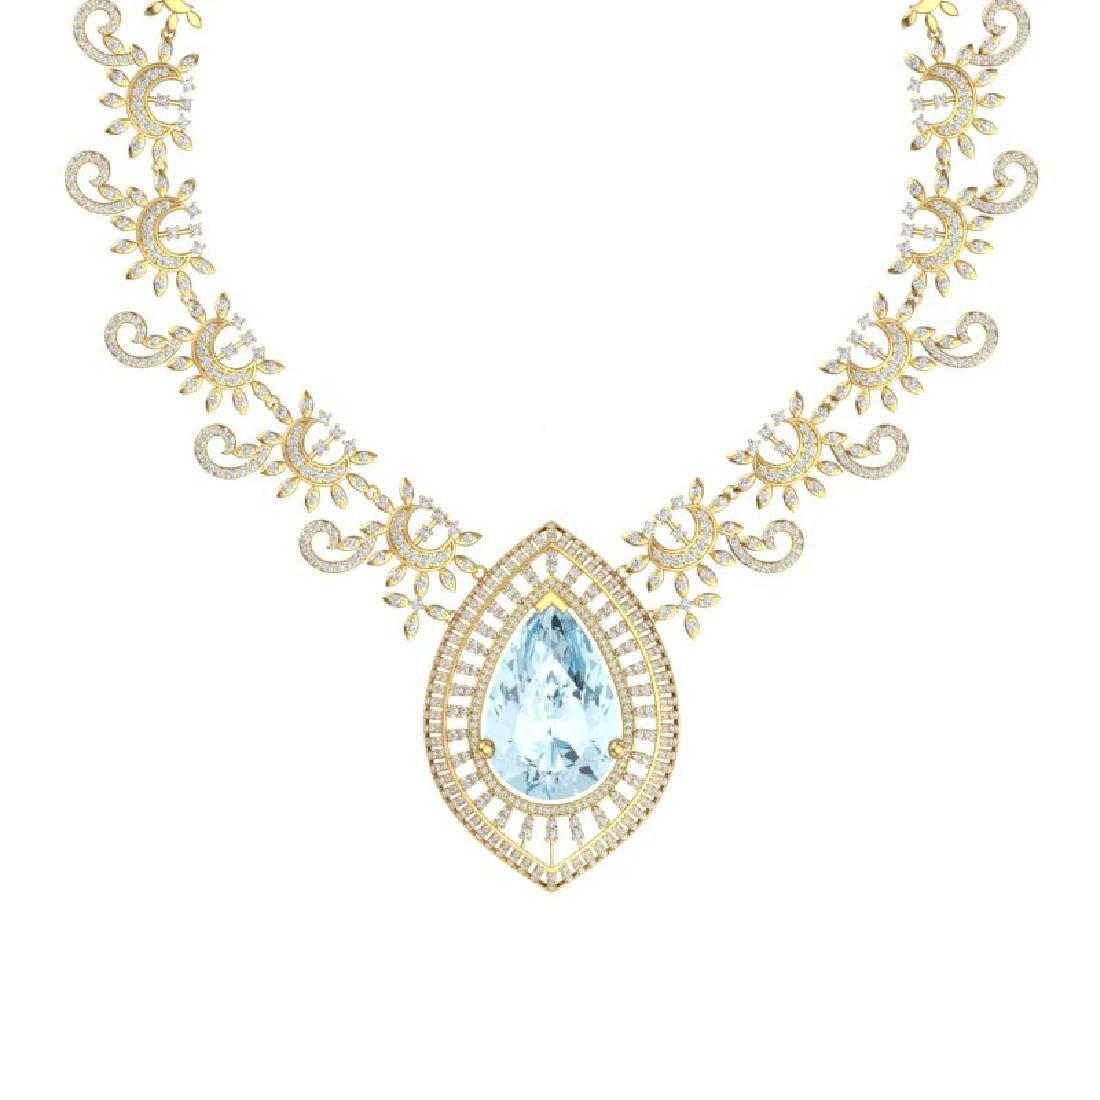 68.1 CTW Royalty Sky Topaz & VS Diamond Necklace 18K - 2